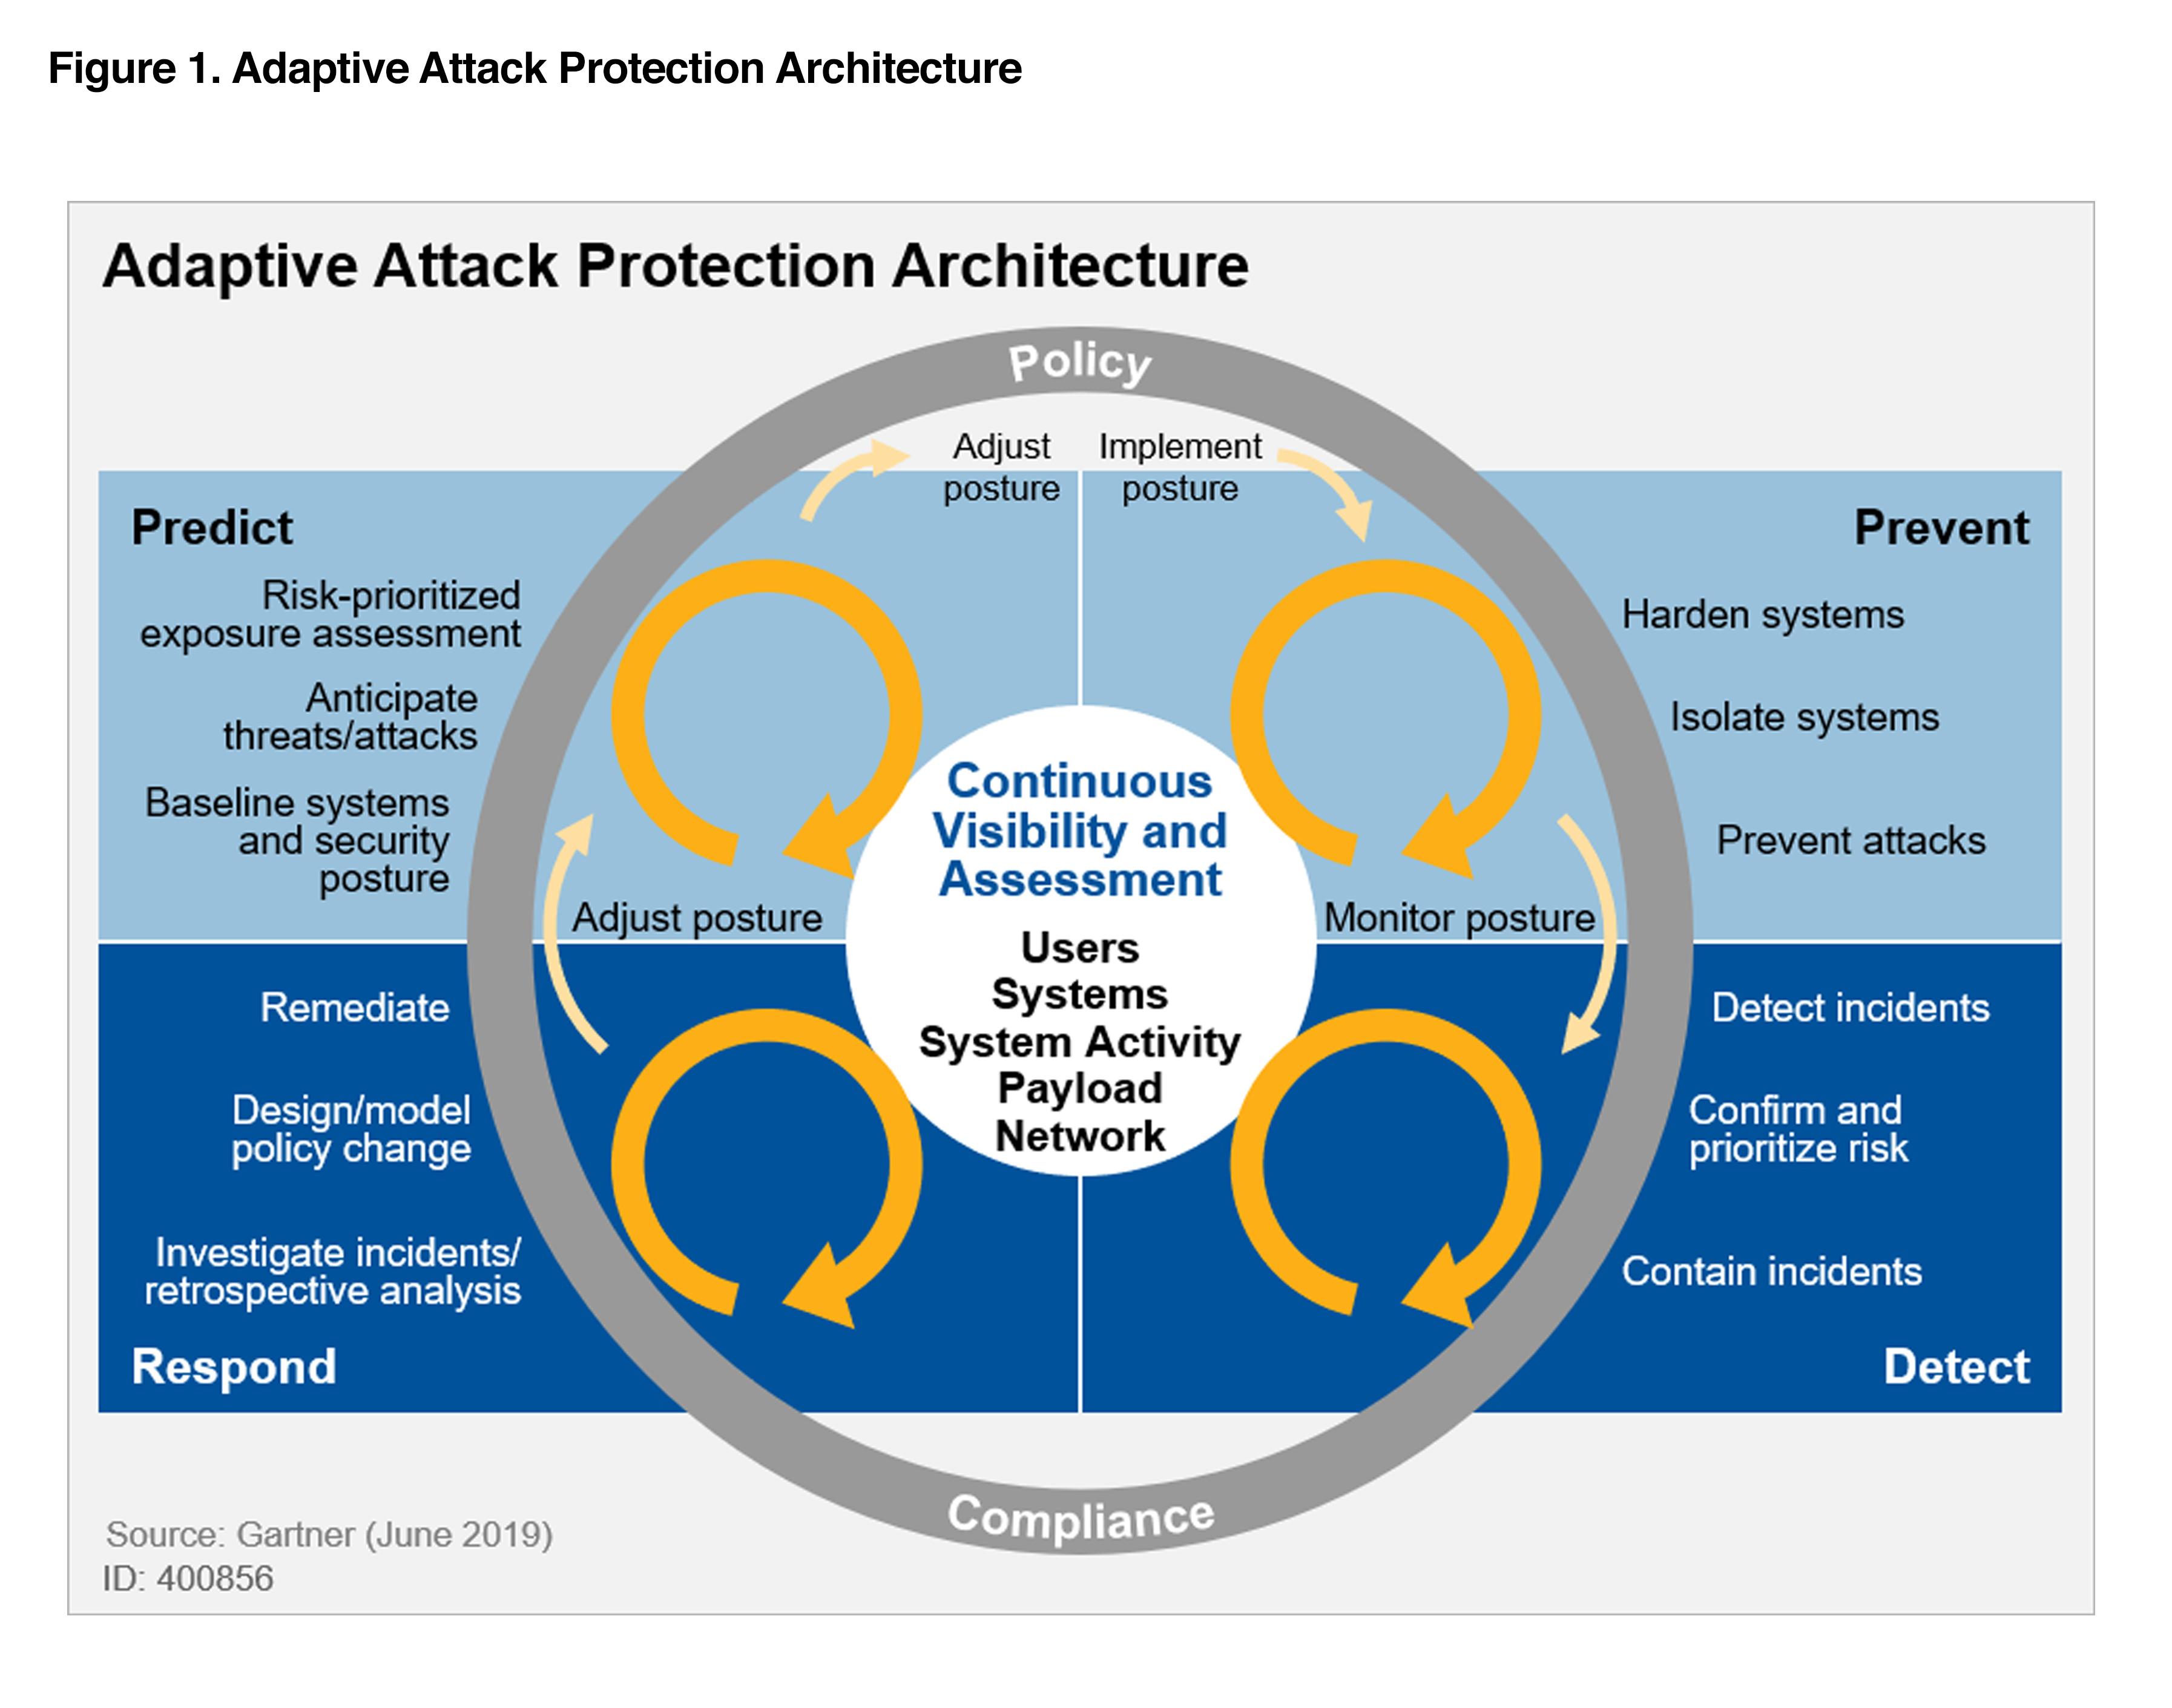 Figure 1. Adaptive Attack Protection Architecture